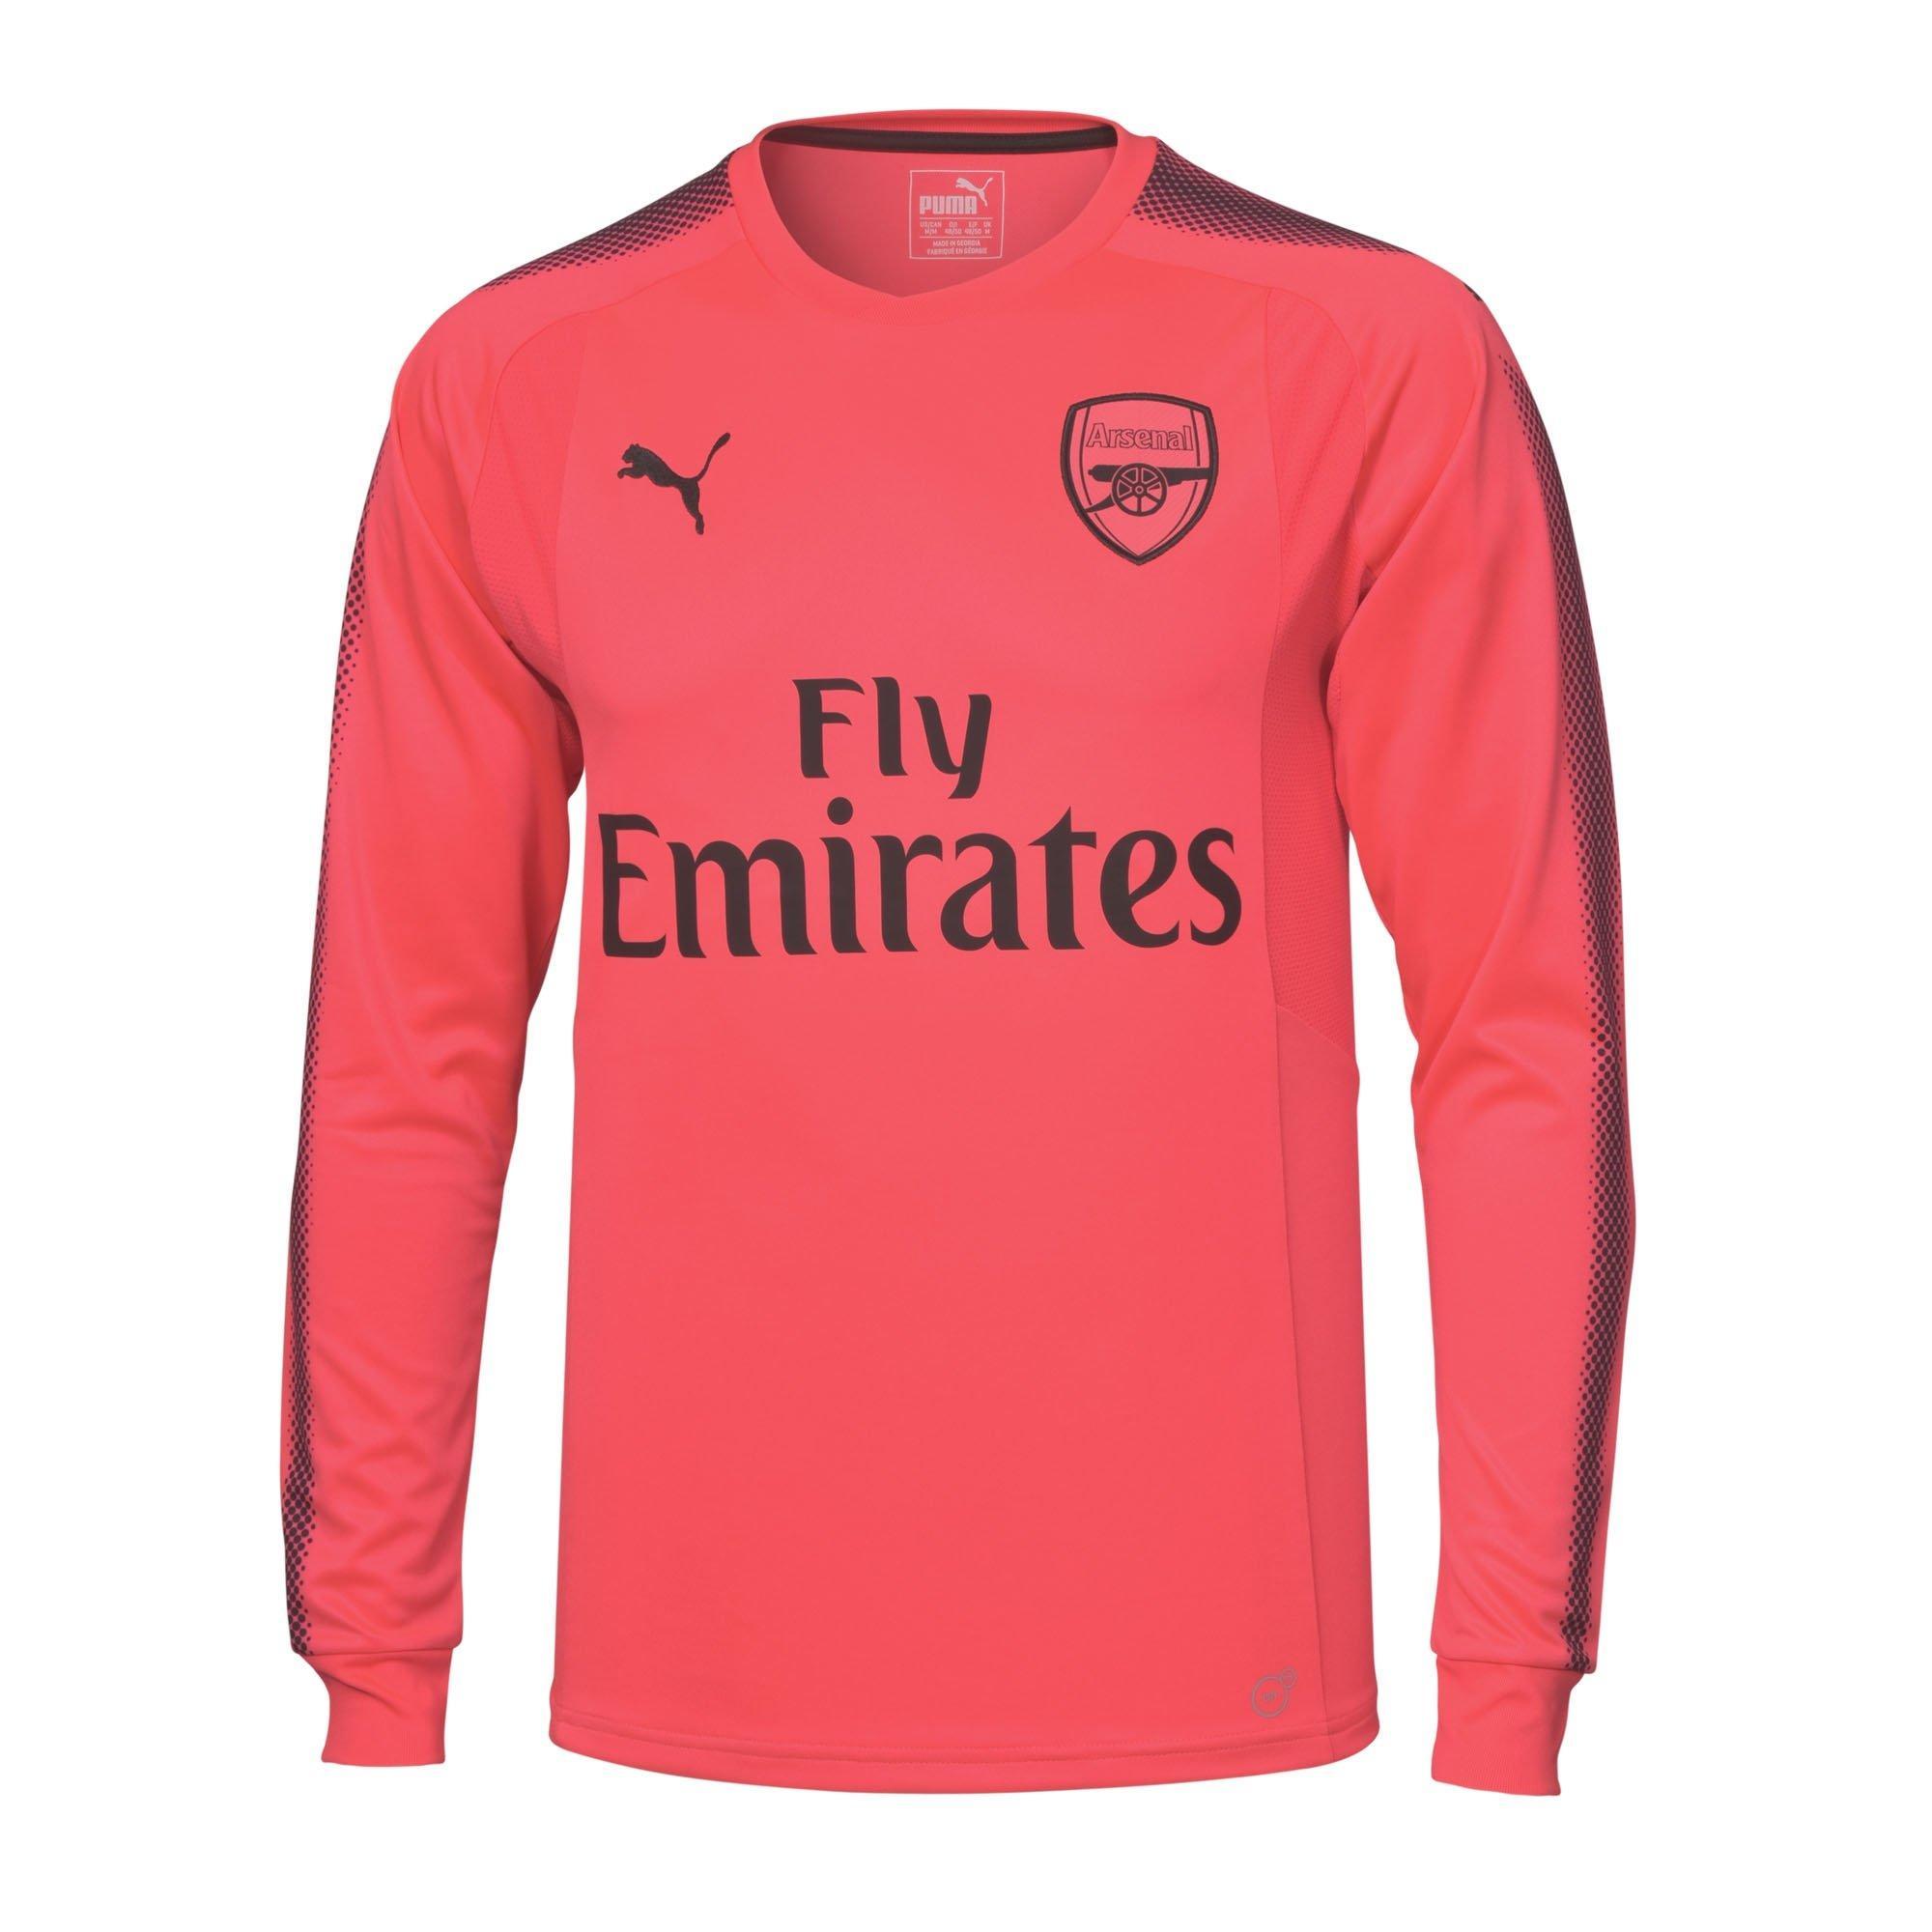 quality design b4bd8 dd219 arsenal away goalkeeper kit